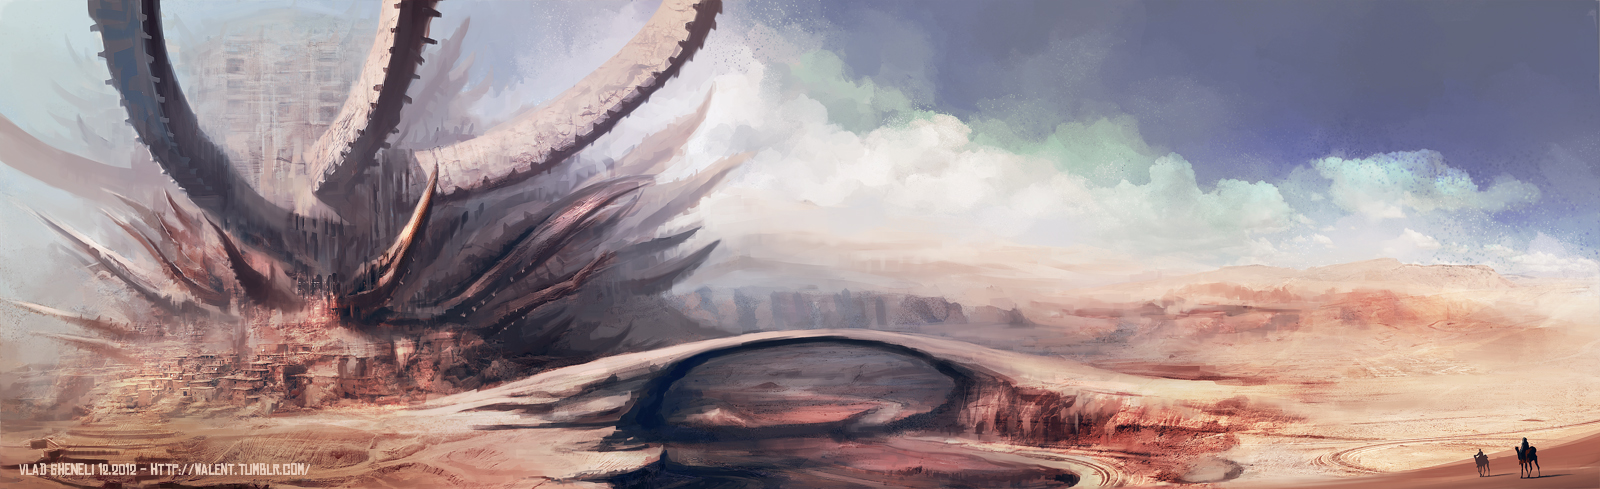 Desert Stronghold by vladgheneli